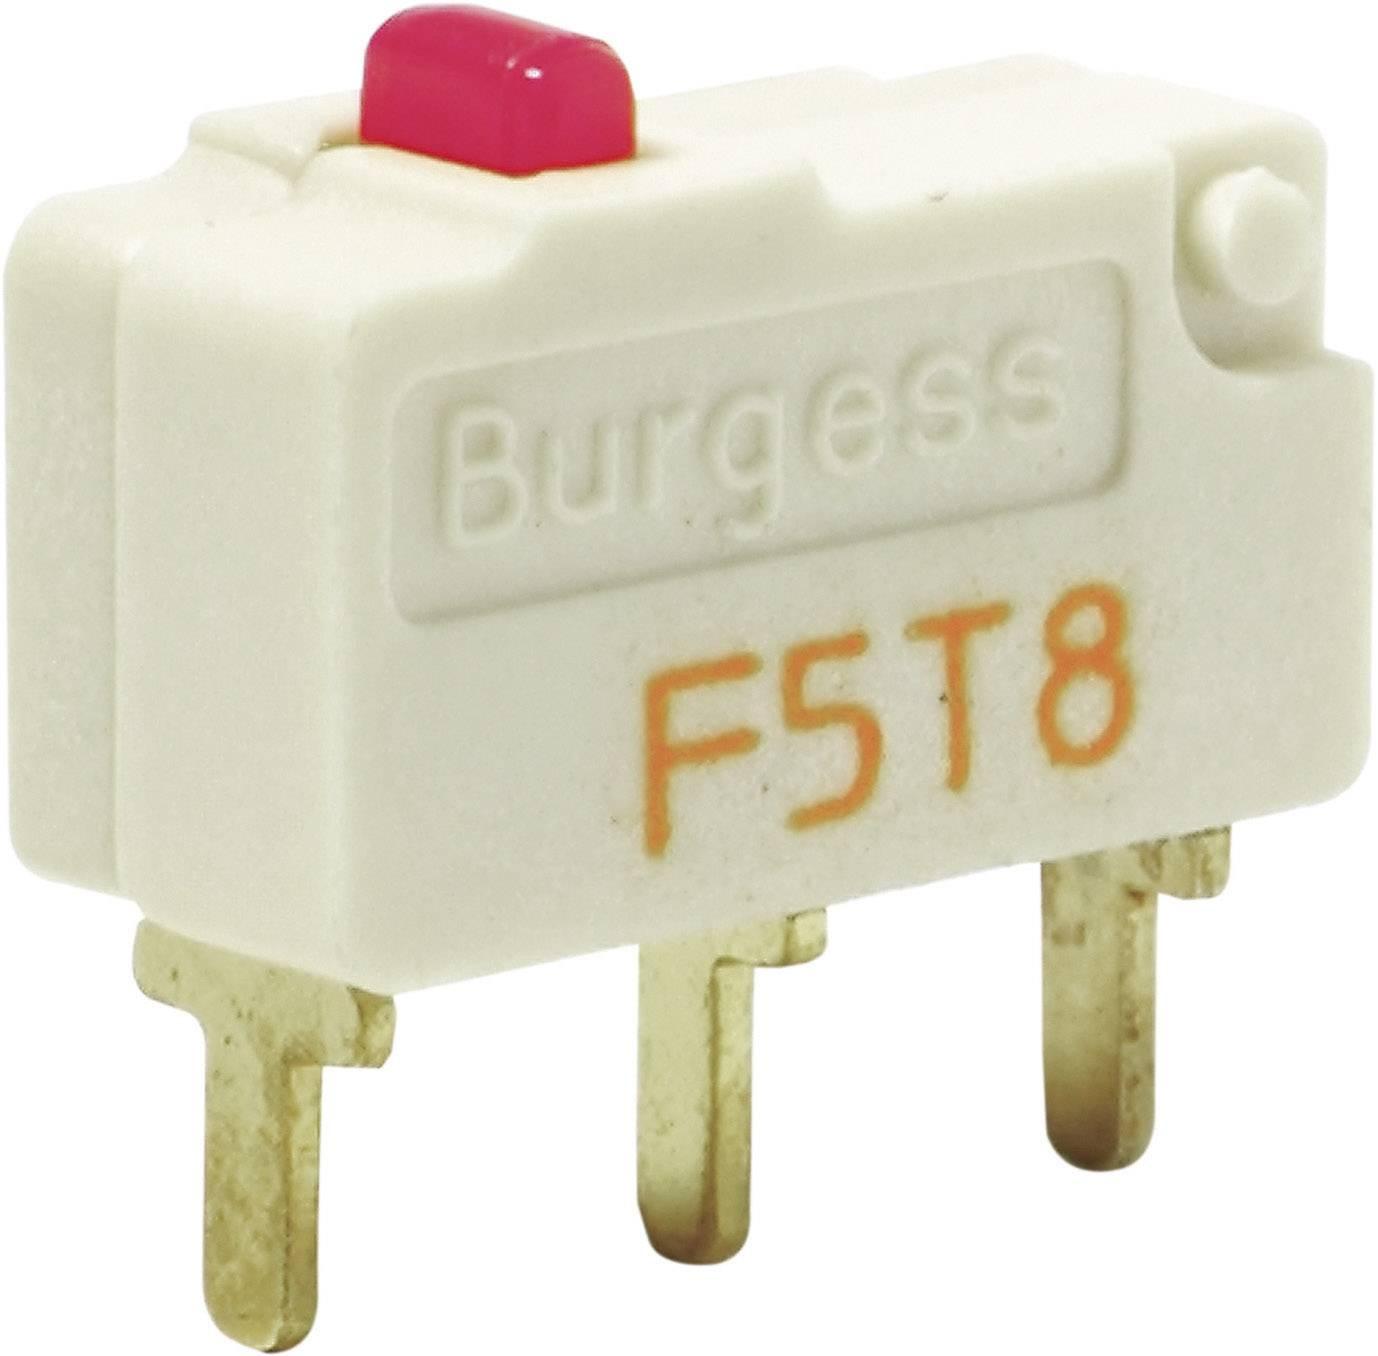 Mikrospínač Burgess F5T8YCUL, 250 V/AC, 5 A, IP40